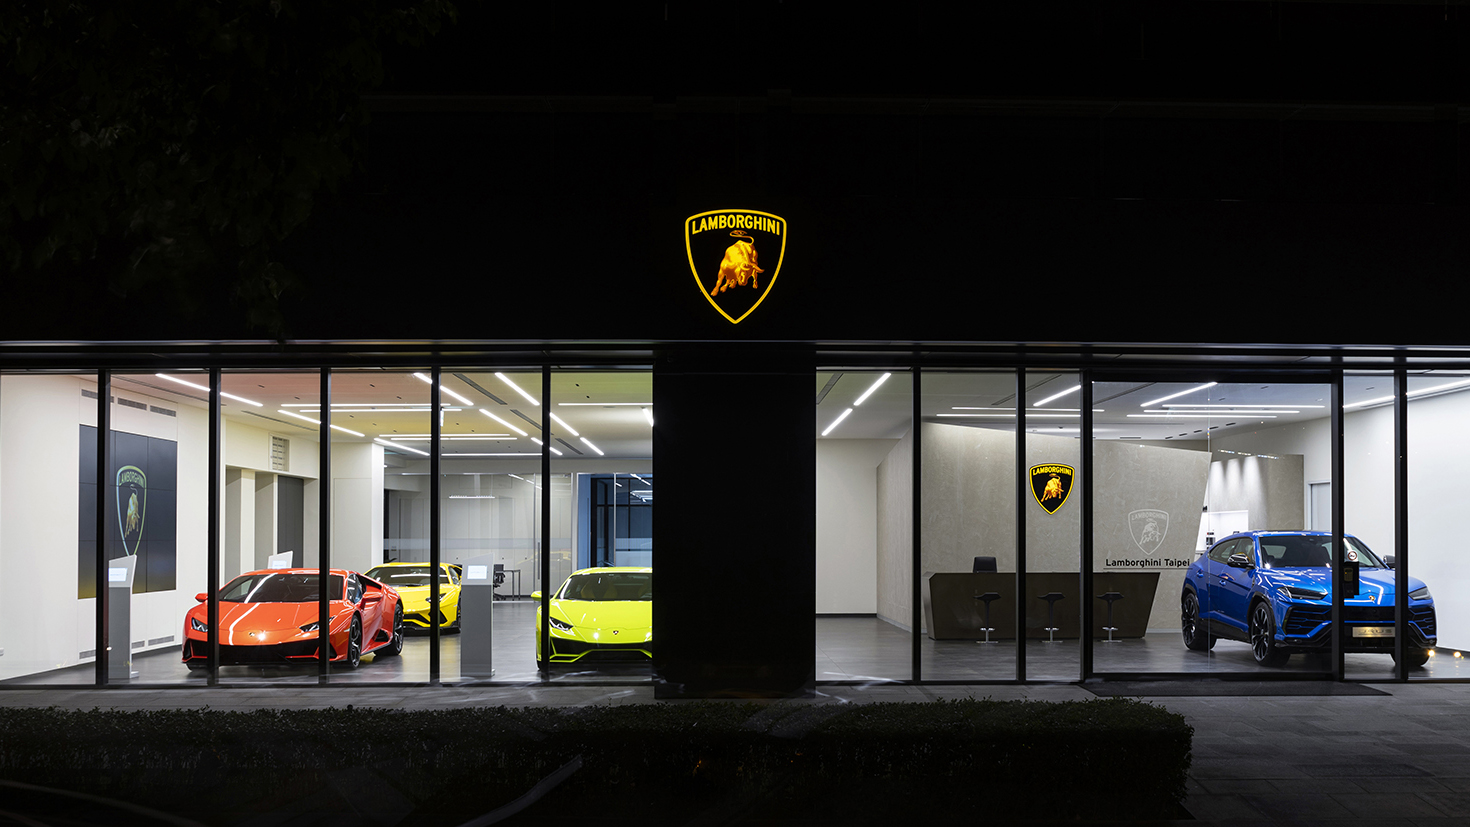 Lamborghini Taipei 展間再升級,強化全臺服務網絡